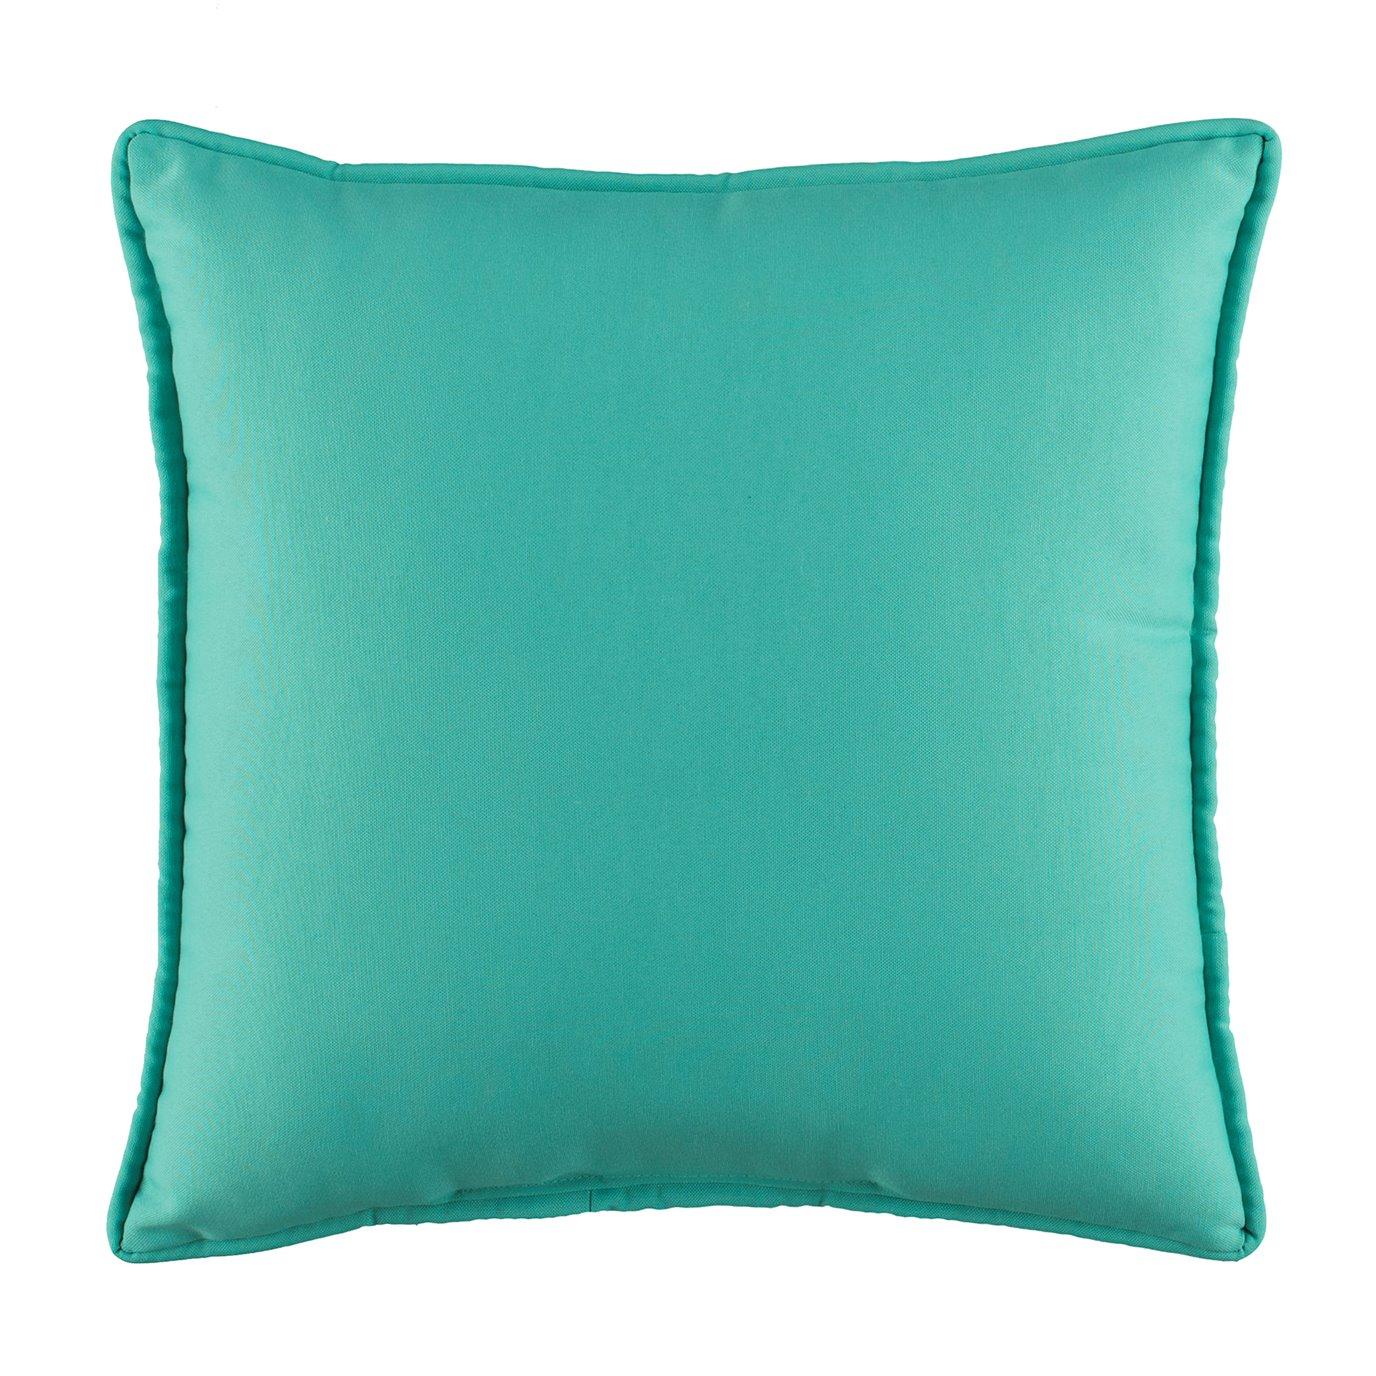 Floridian Flamingo Solid Blue Square Pillow